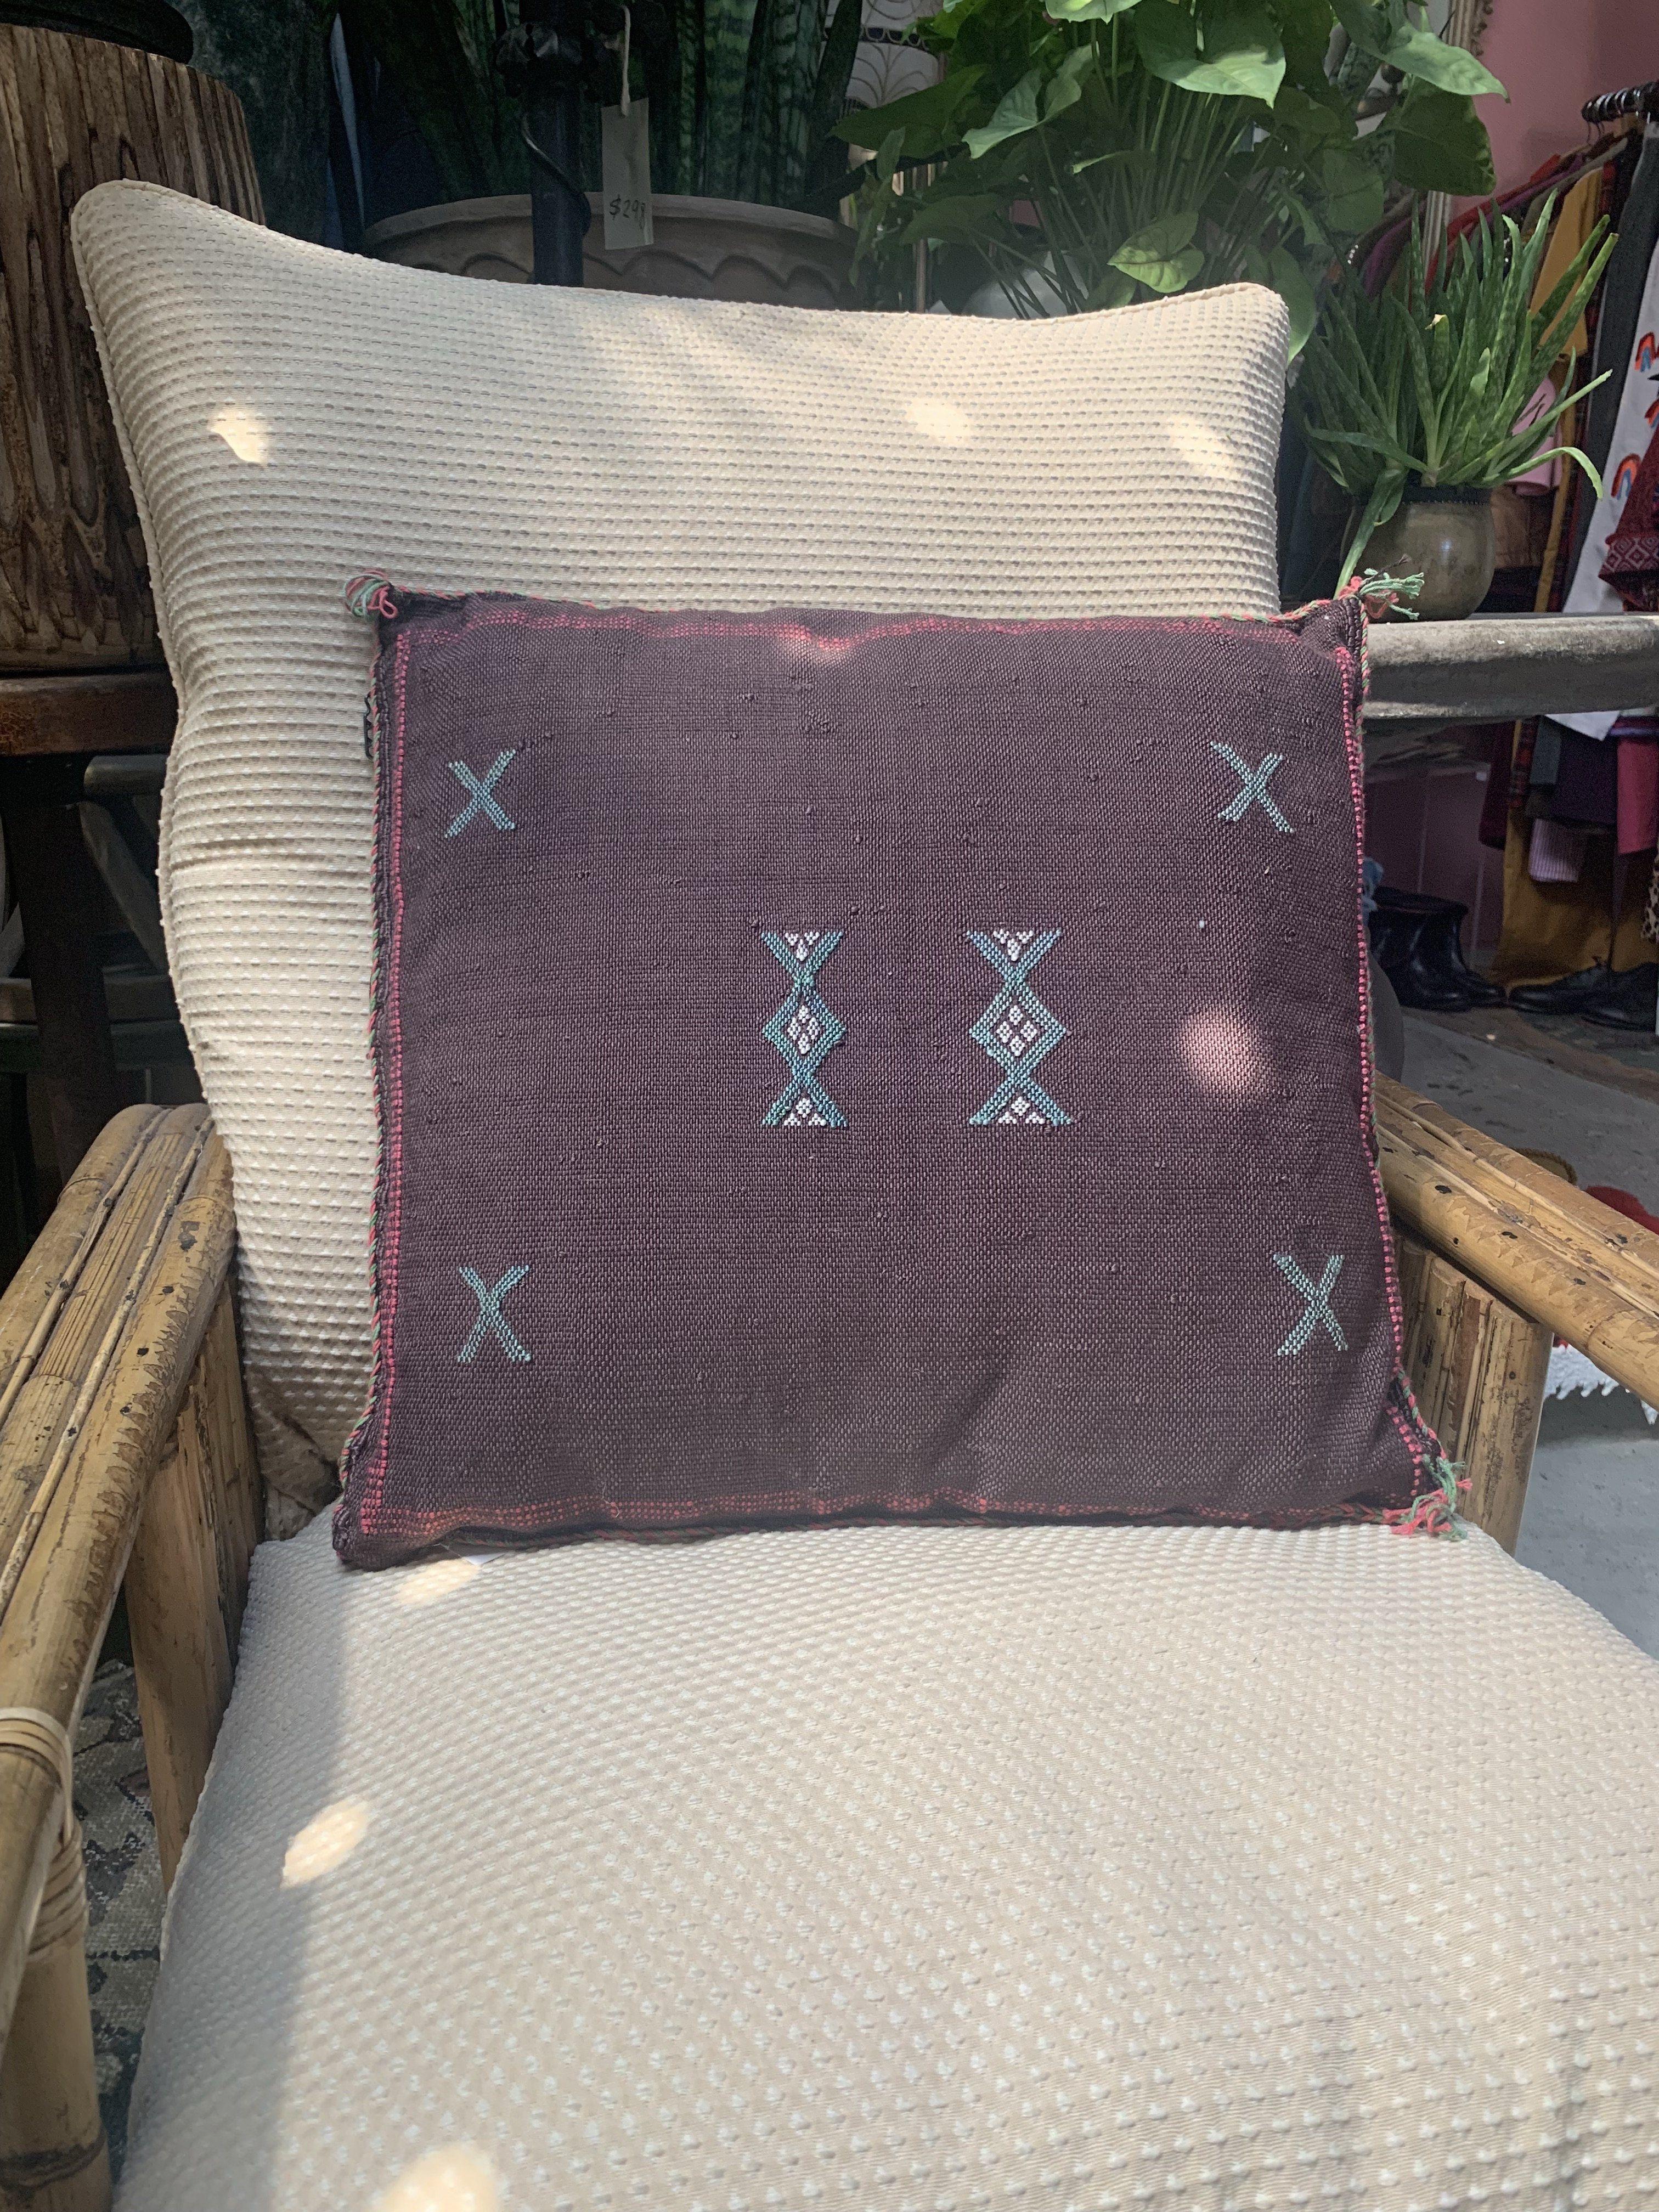 Plum Cactus Silk Embroidery Pillow - Default Title